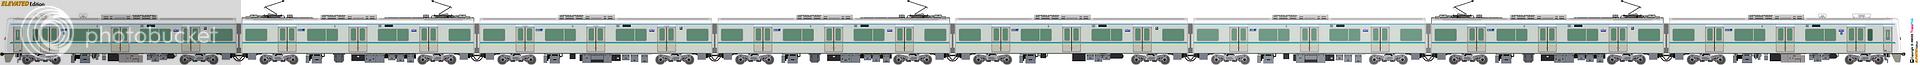 [5388] Chiba Newtown Railway 2388